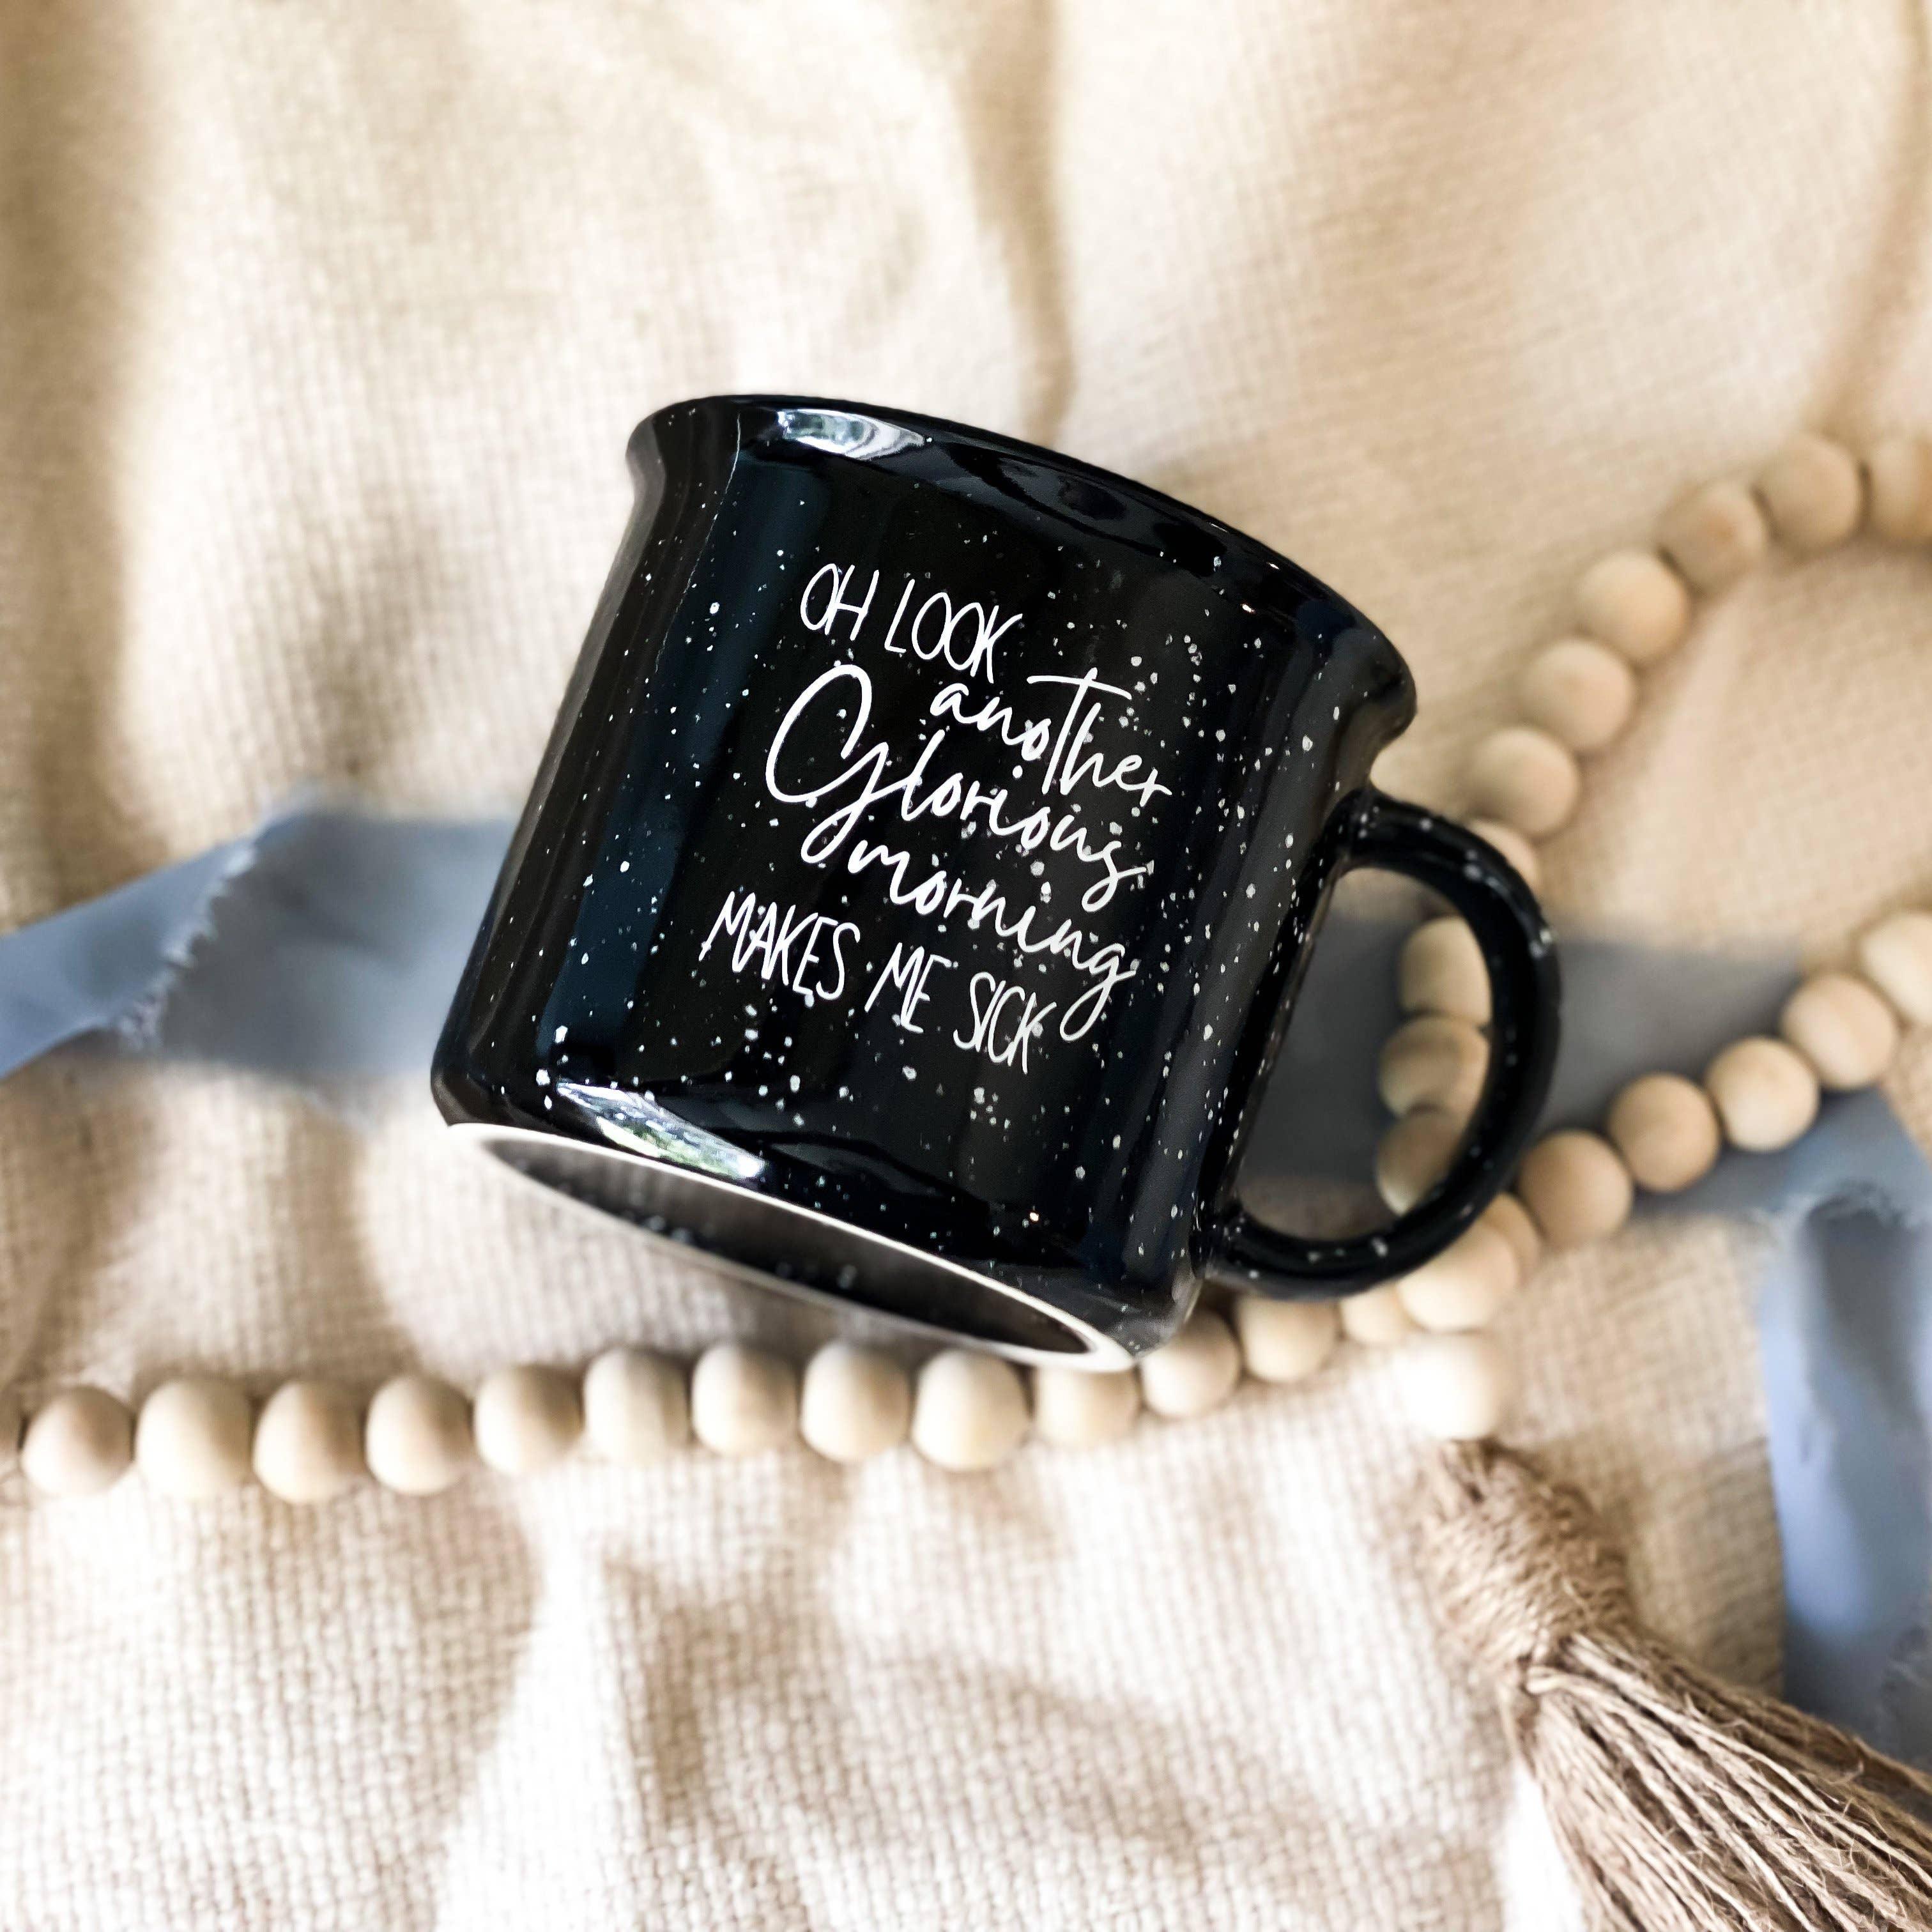 Black Glorious Morning Hocus Pocus Camper Mug